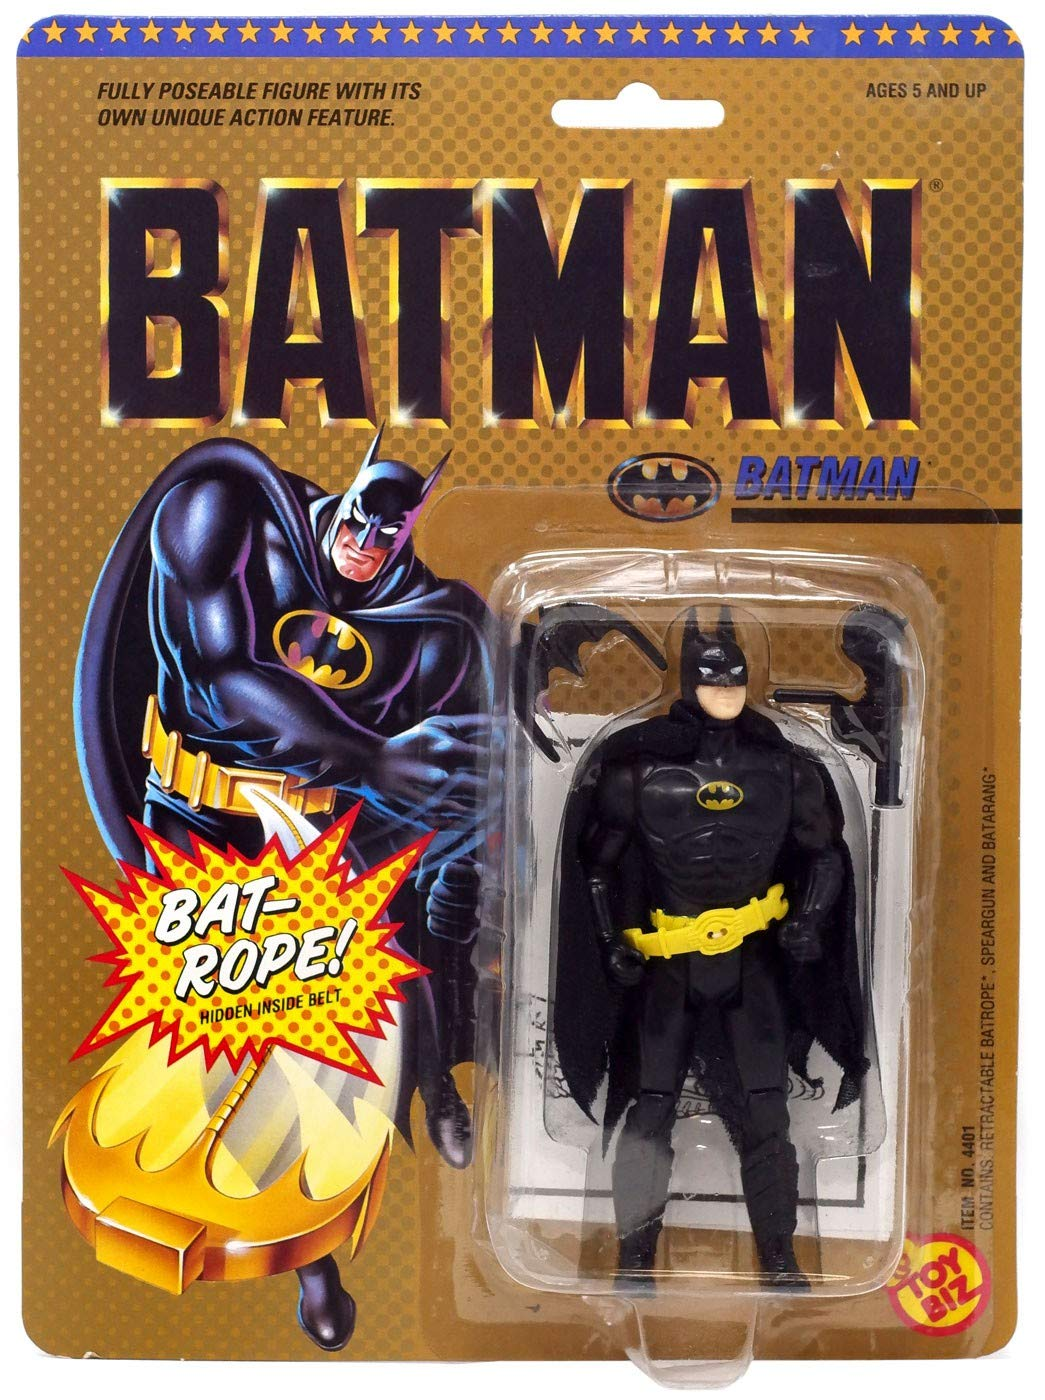 Batman Vintage 1989 Michael Keaton Movie Action Figure Toy Biz SG/_B000BN8UC6/_US